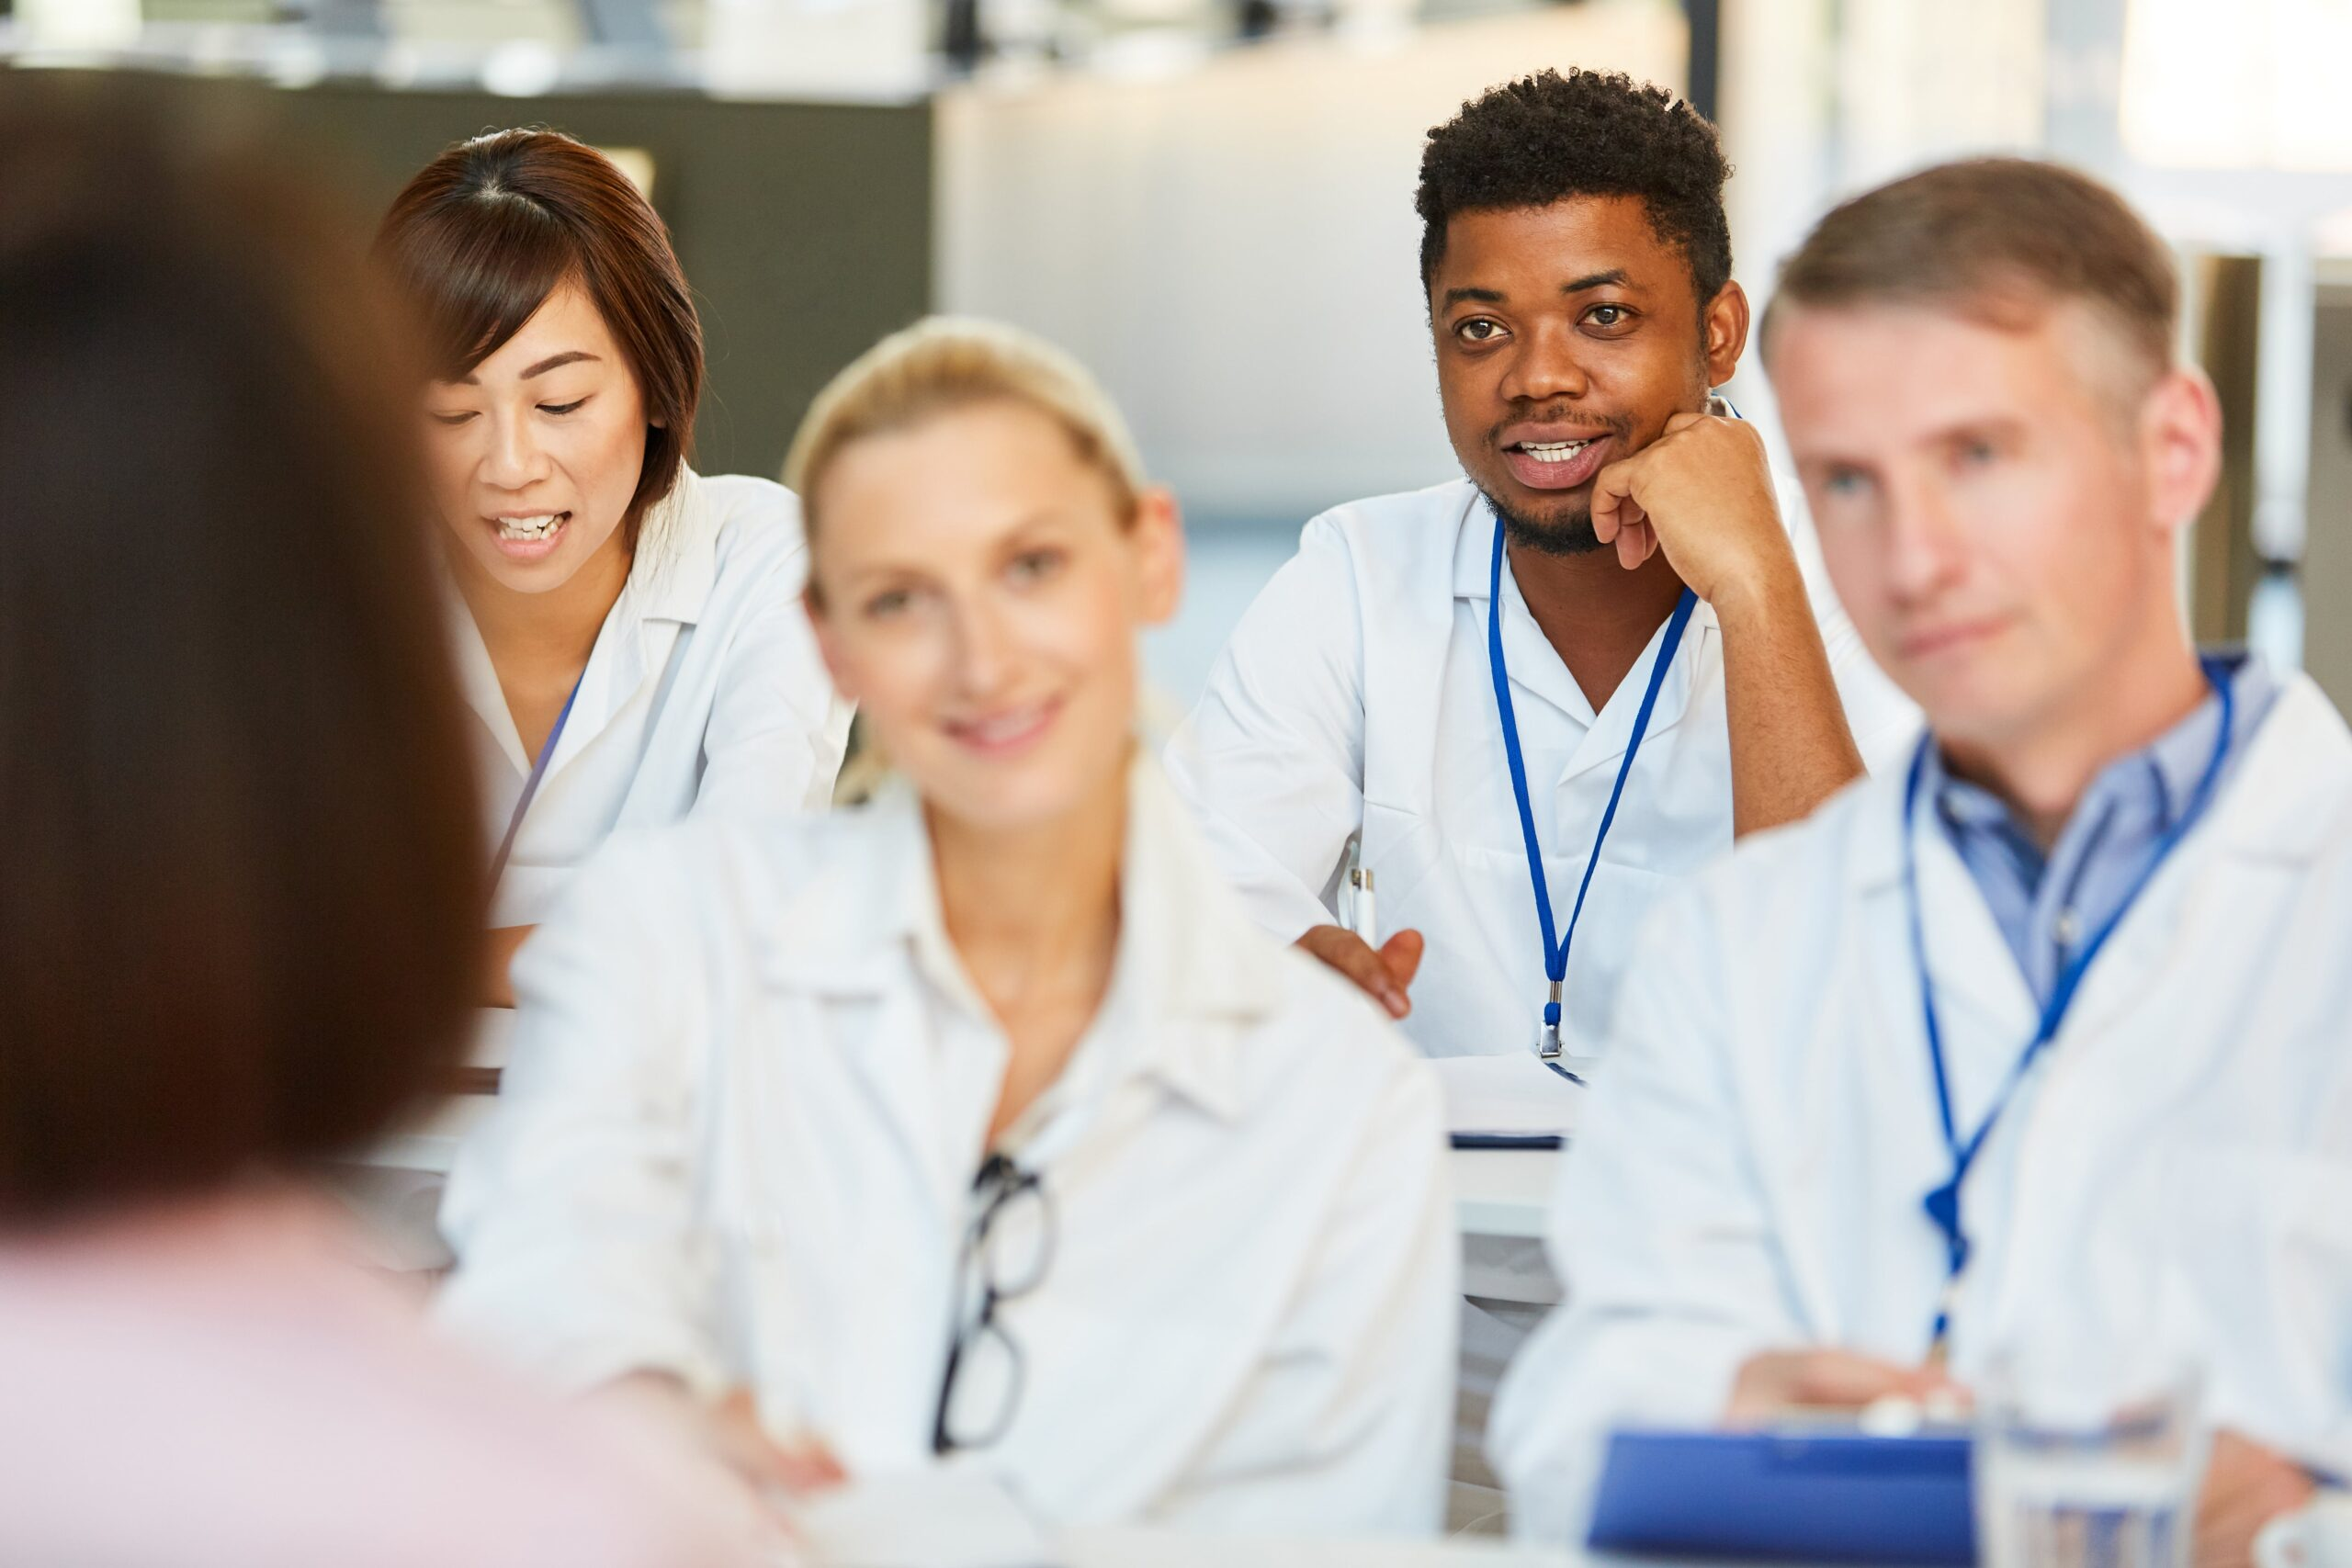 Nurse Aide Training Program Instructor